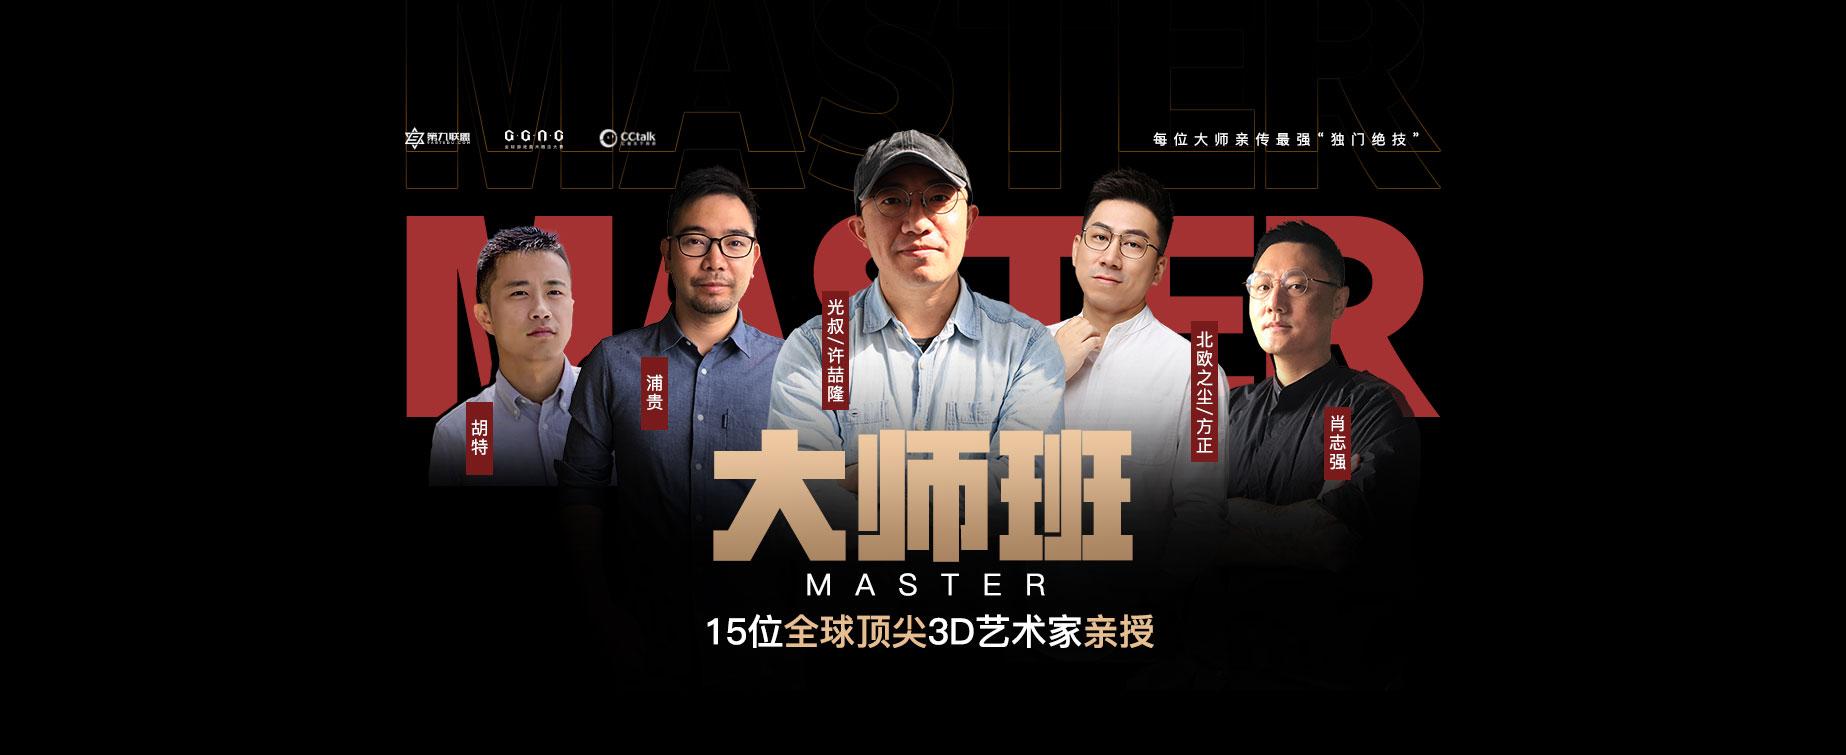 第九联盟大师课banner